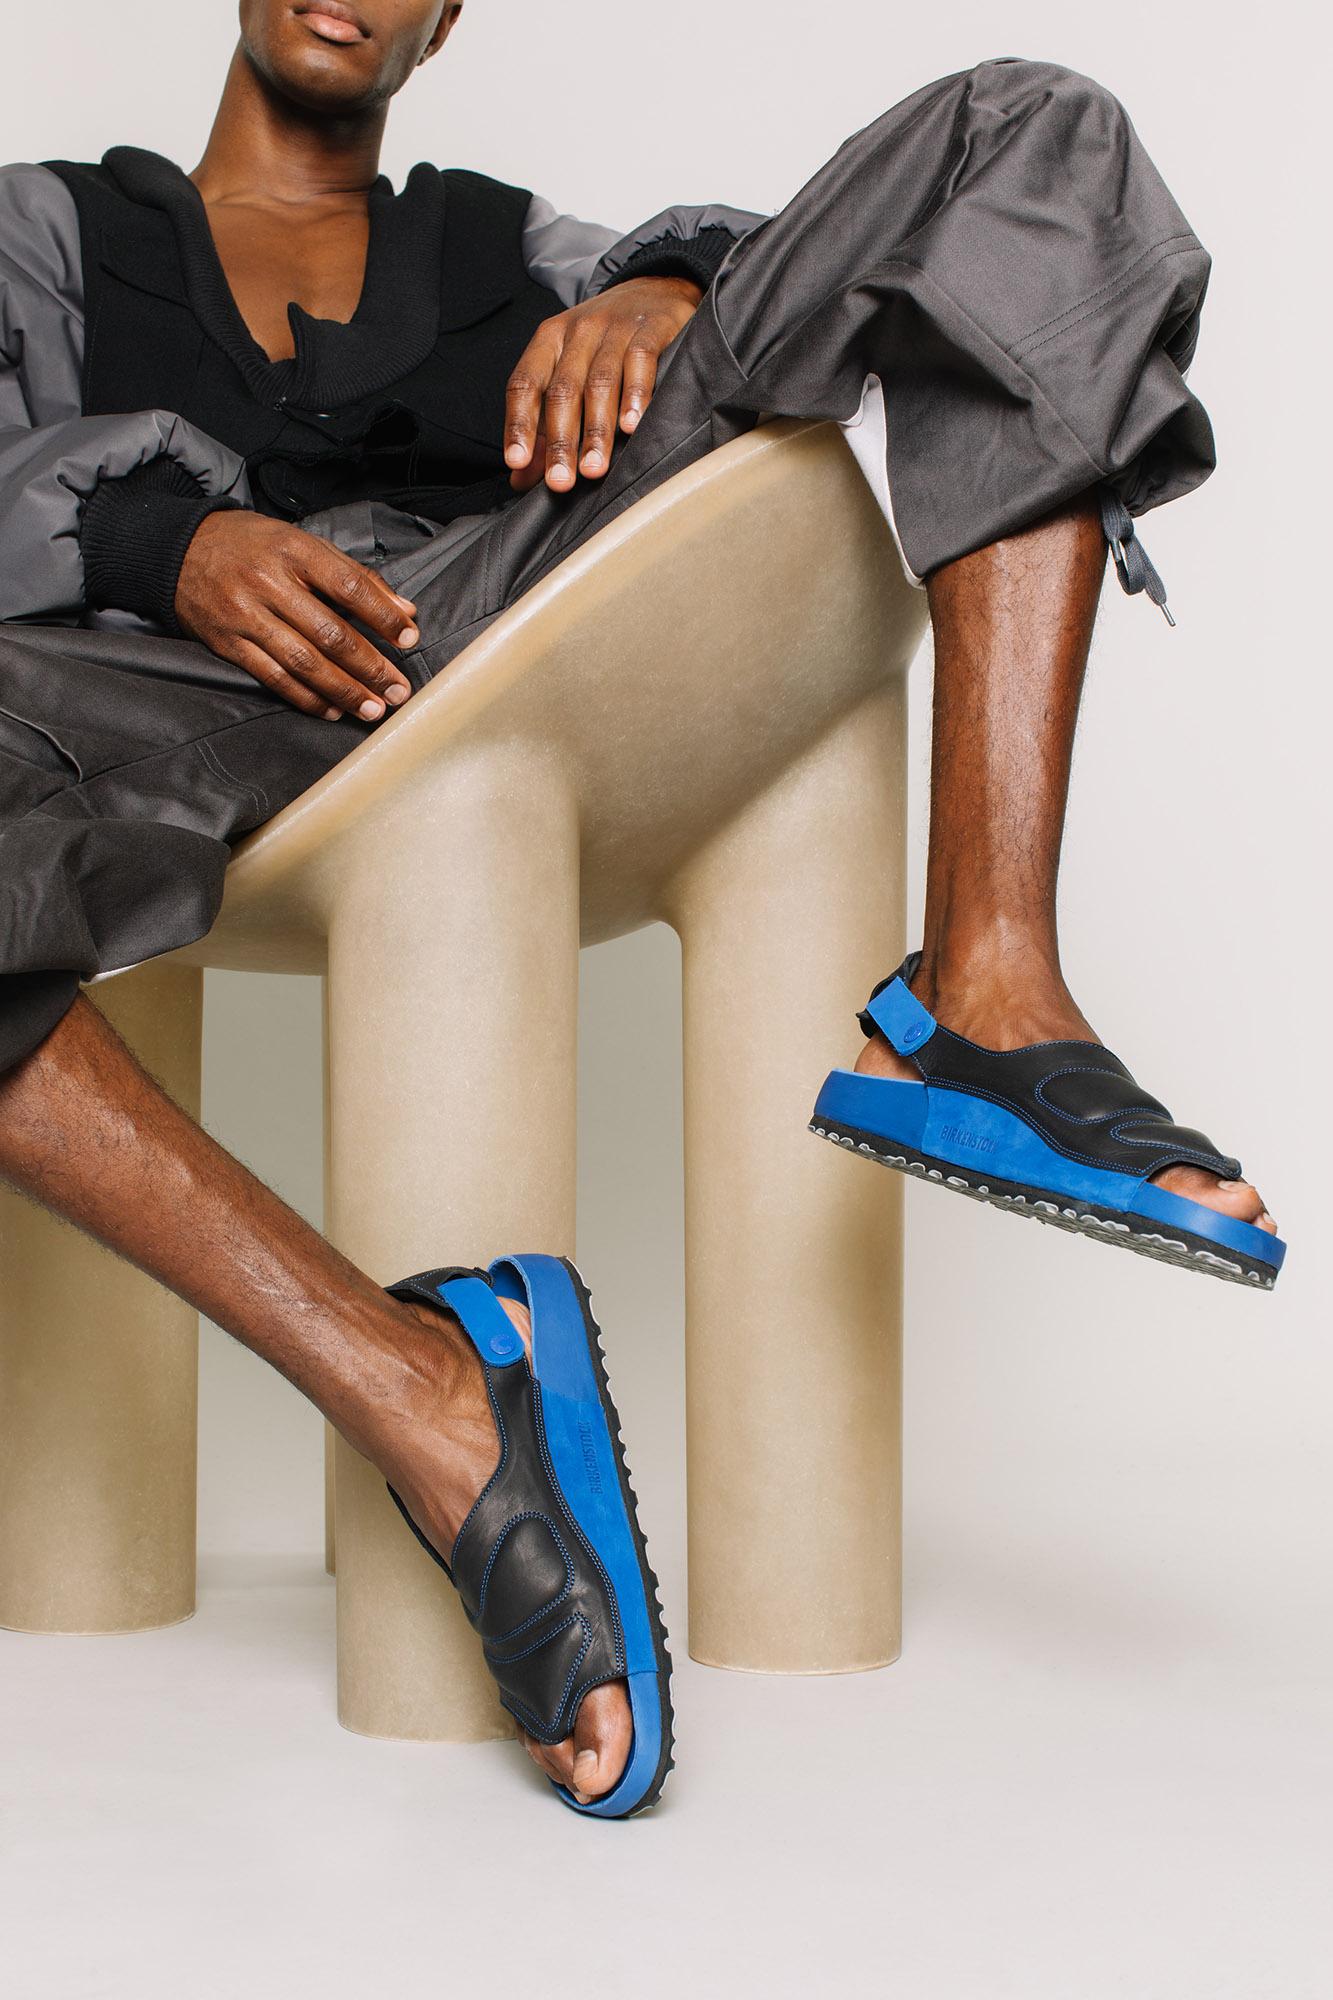 Birkenstock's Central Saint Martins collaboration highlights four emerging designers